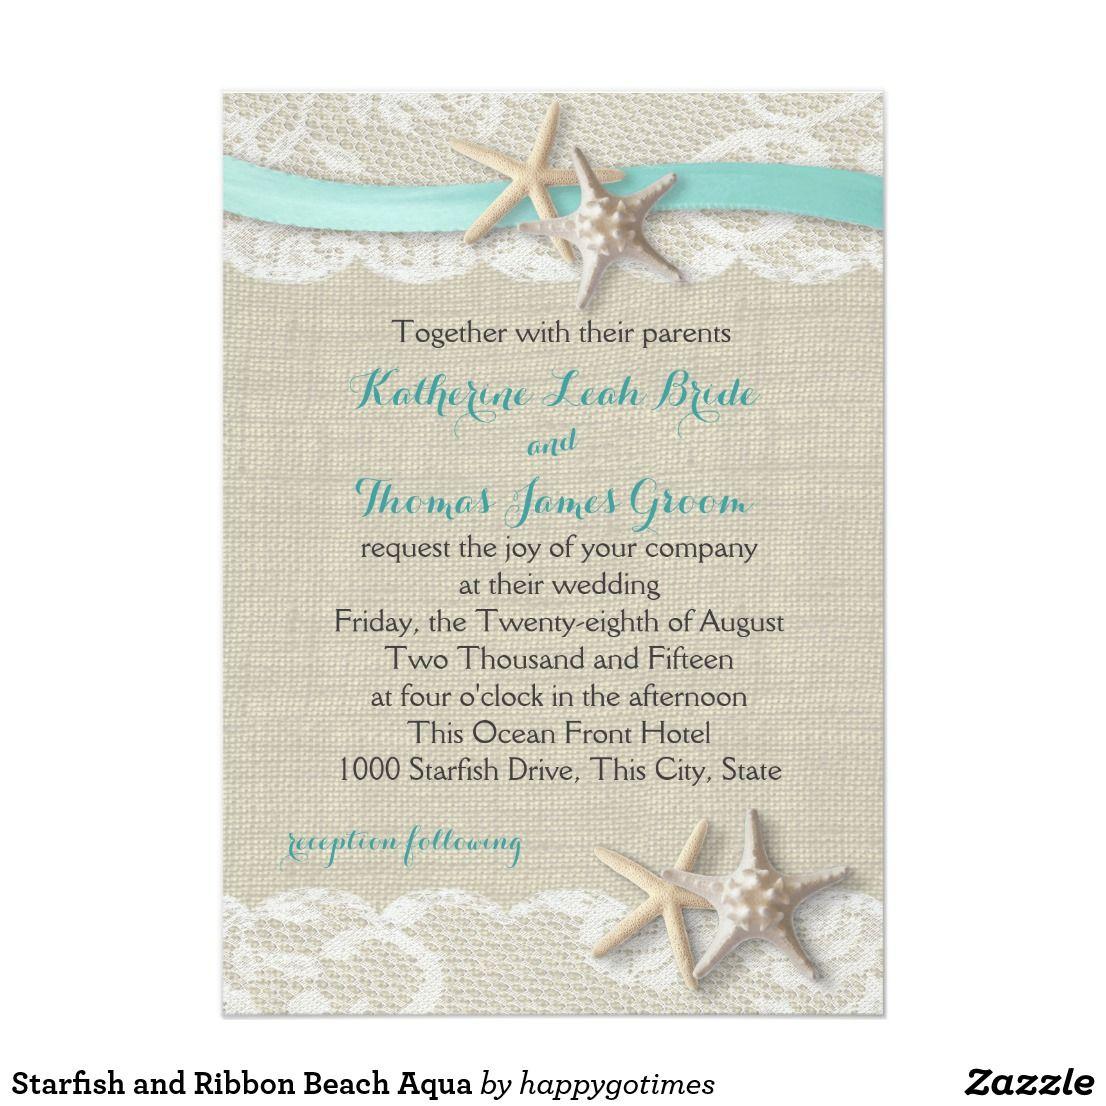 Starfish and Ribbon Beach Aqua | Destination Weddings | Pinterest ...